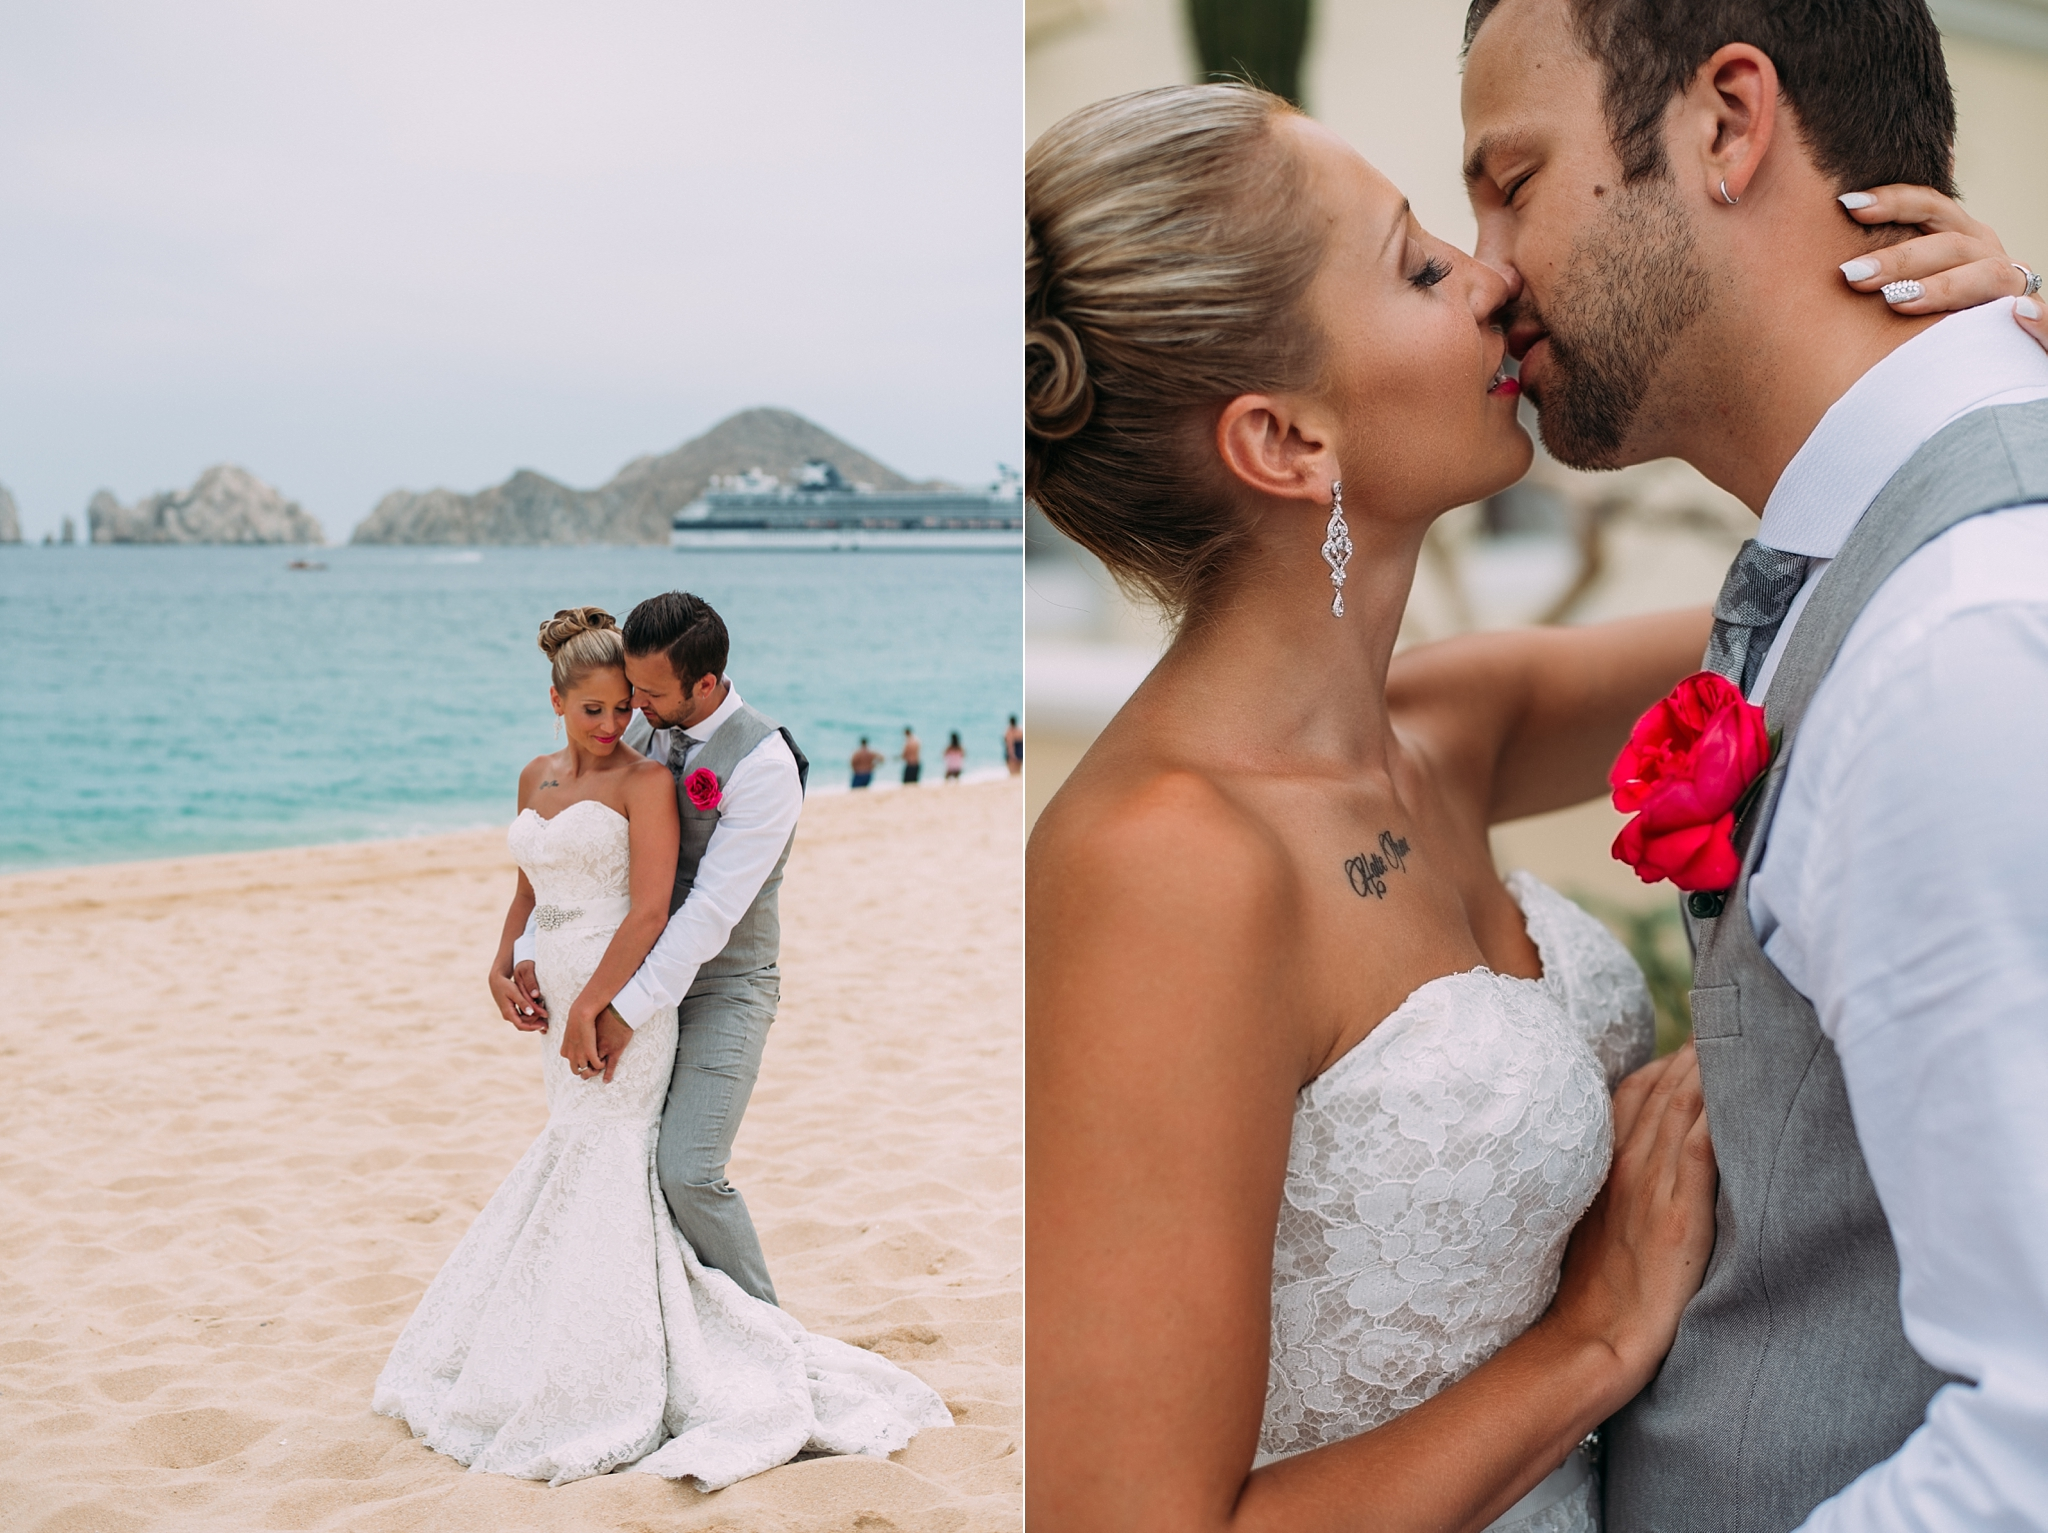 kaihla_tonai_intimate_wedding_elopement_photographer_1366